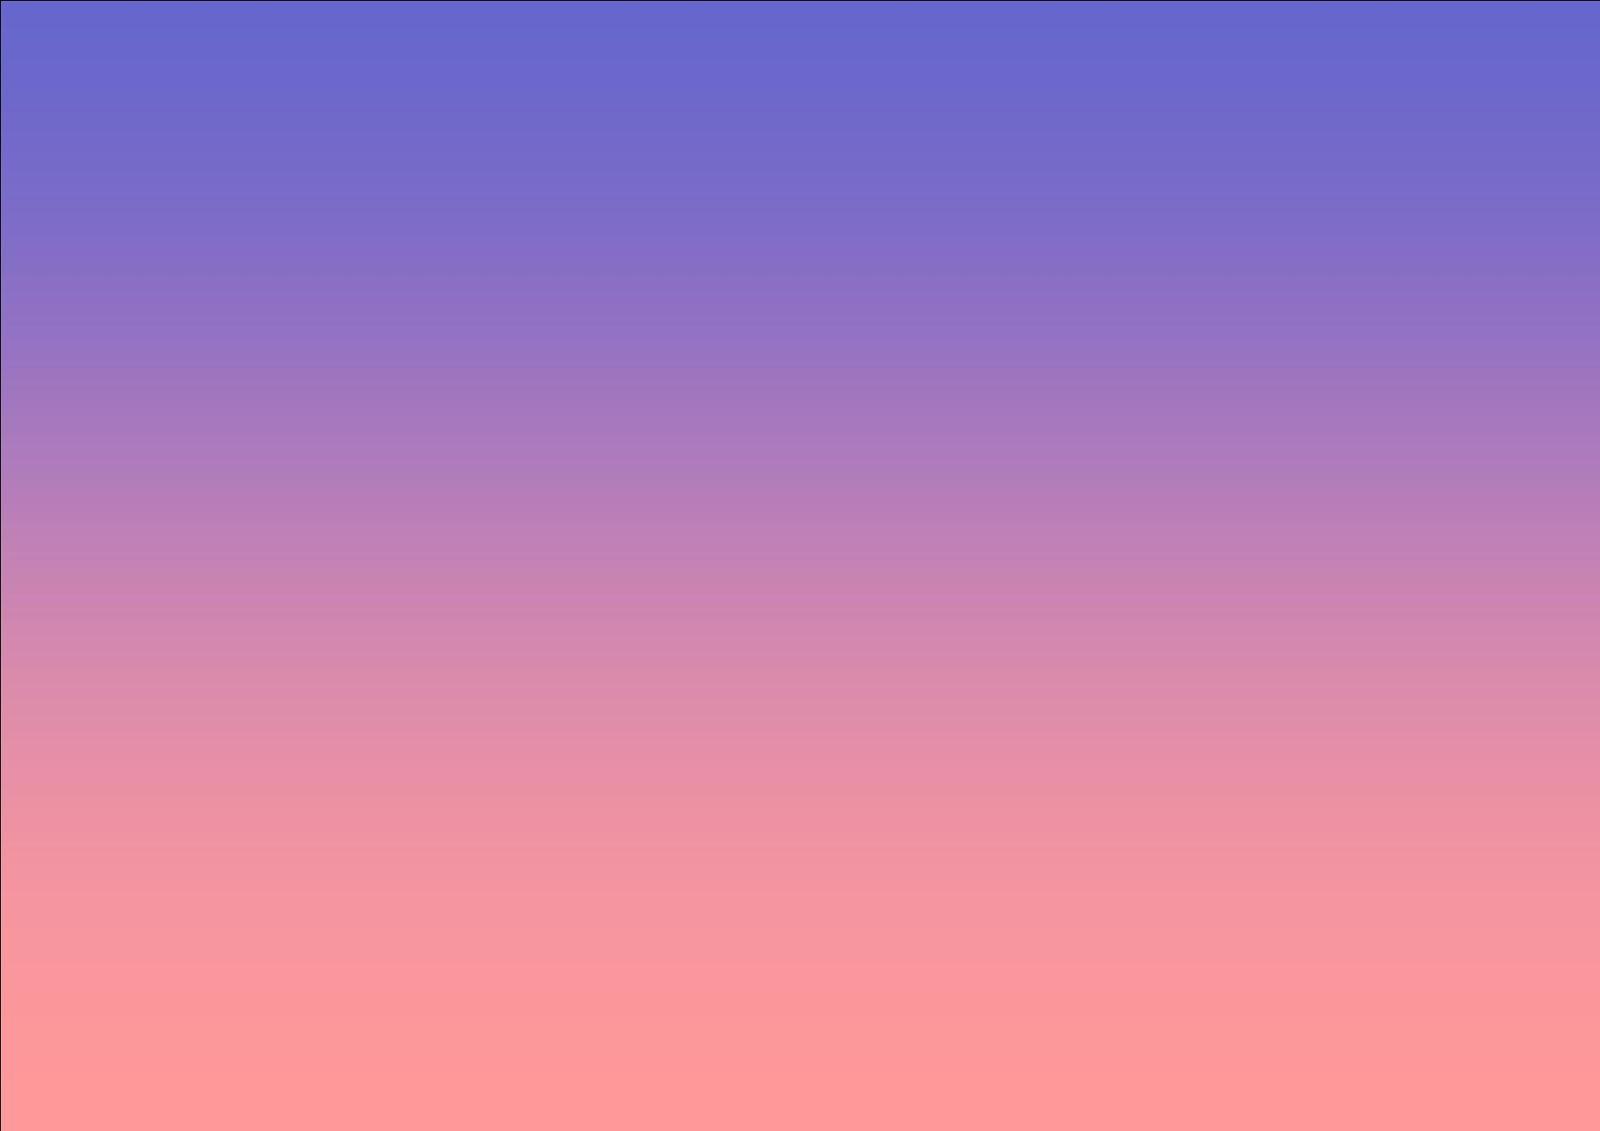 Imagenes Tumblr Colores Pastel: Fondos Degradee De Colores Pasteles